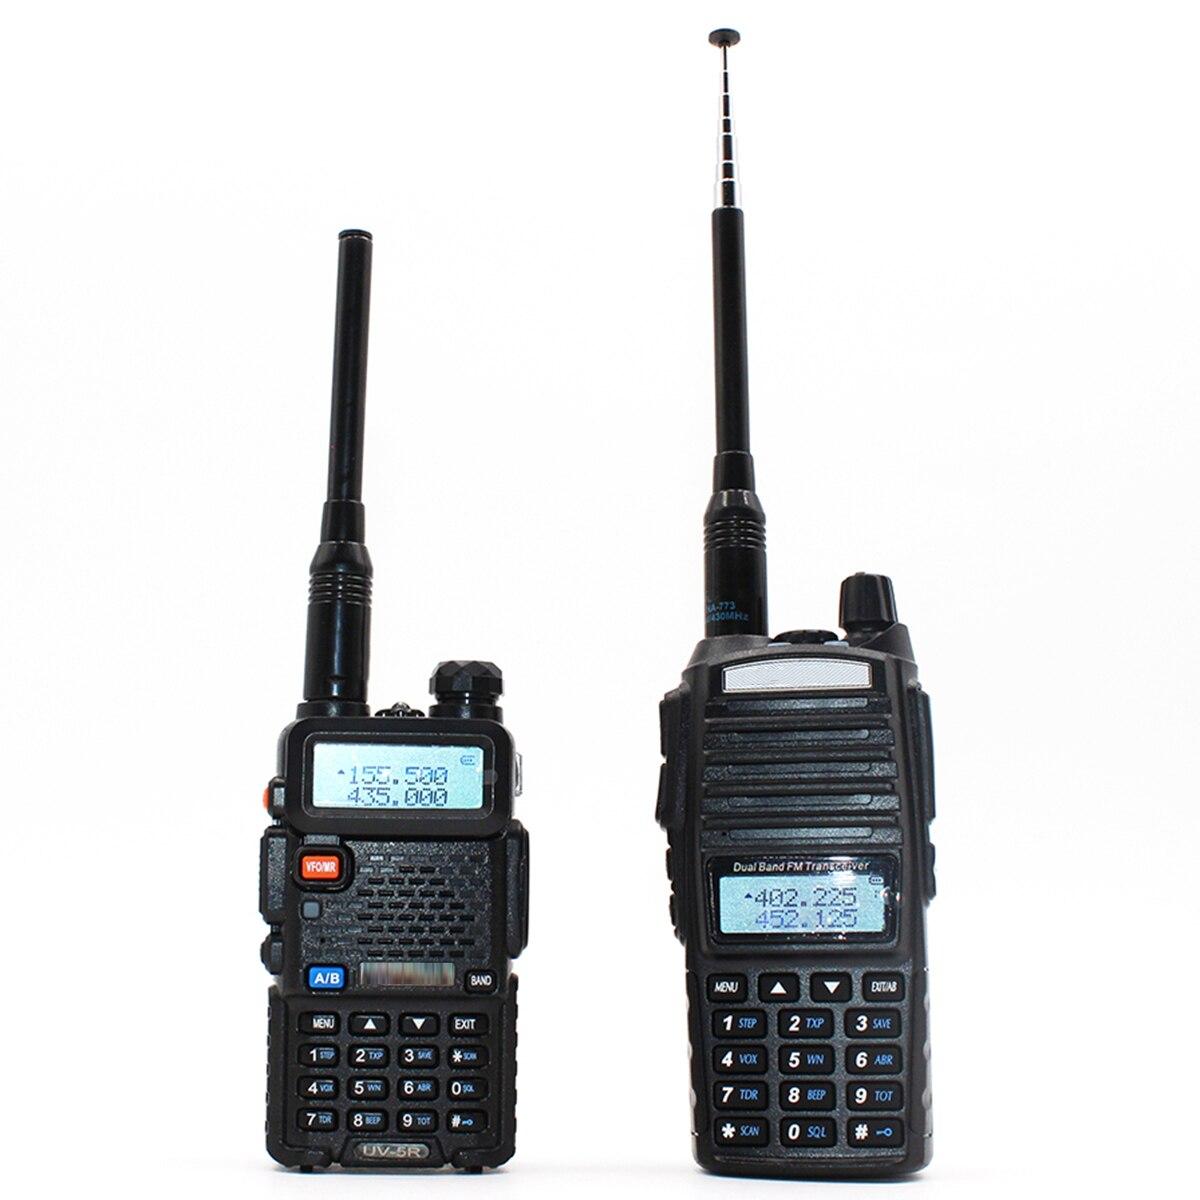 2020 nova sma fêmea vhf uhf dupla banda walkie talkie antena telescópica para baofeng walkie talkie UV-5R UV-82 BF-888S